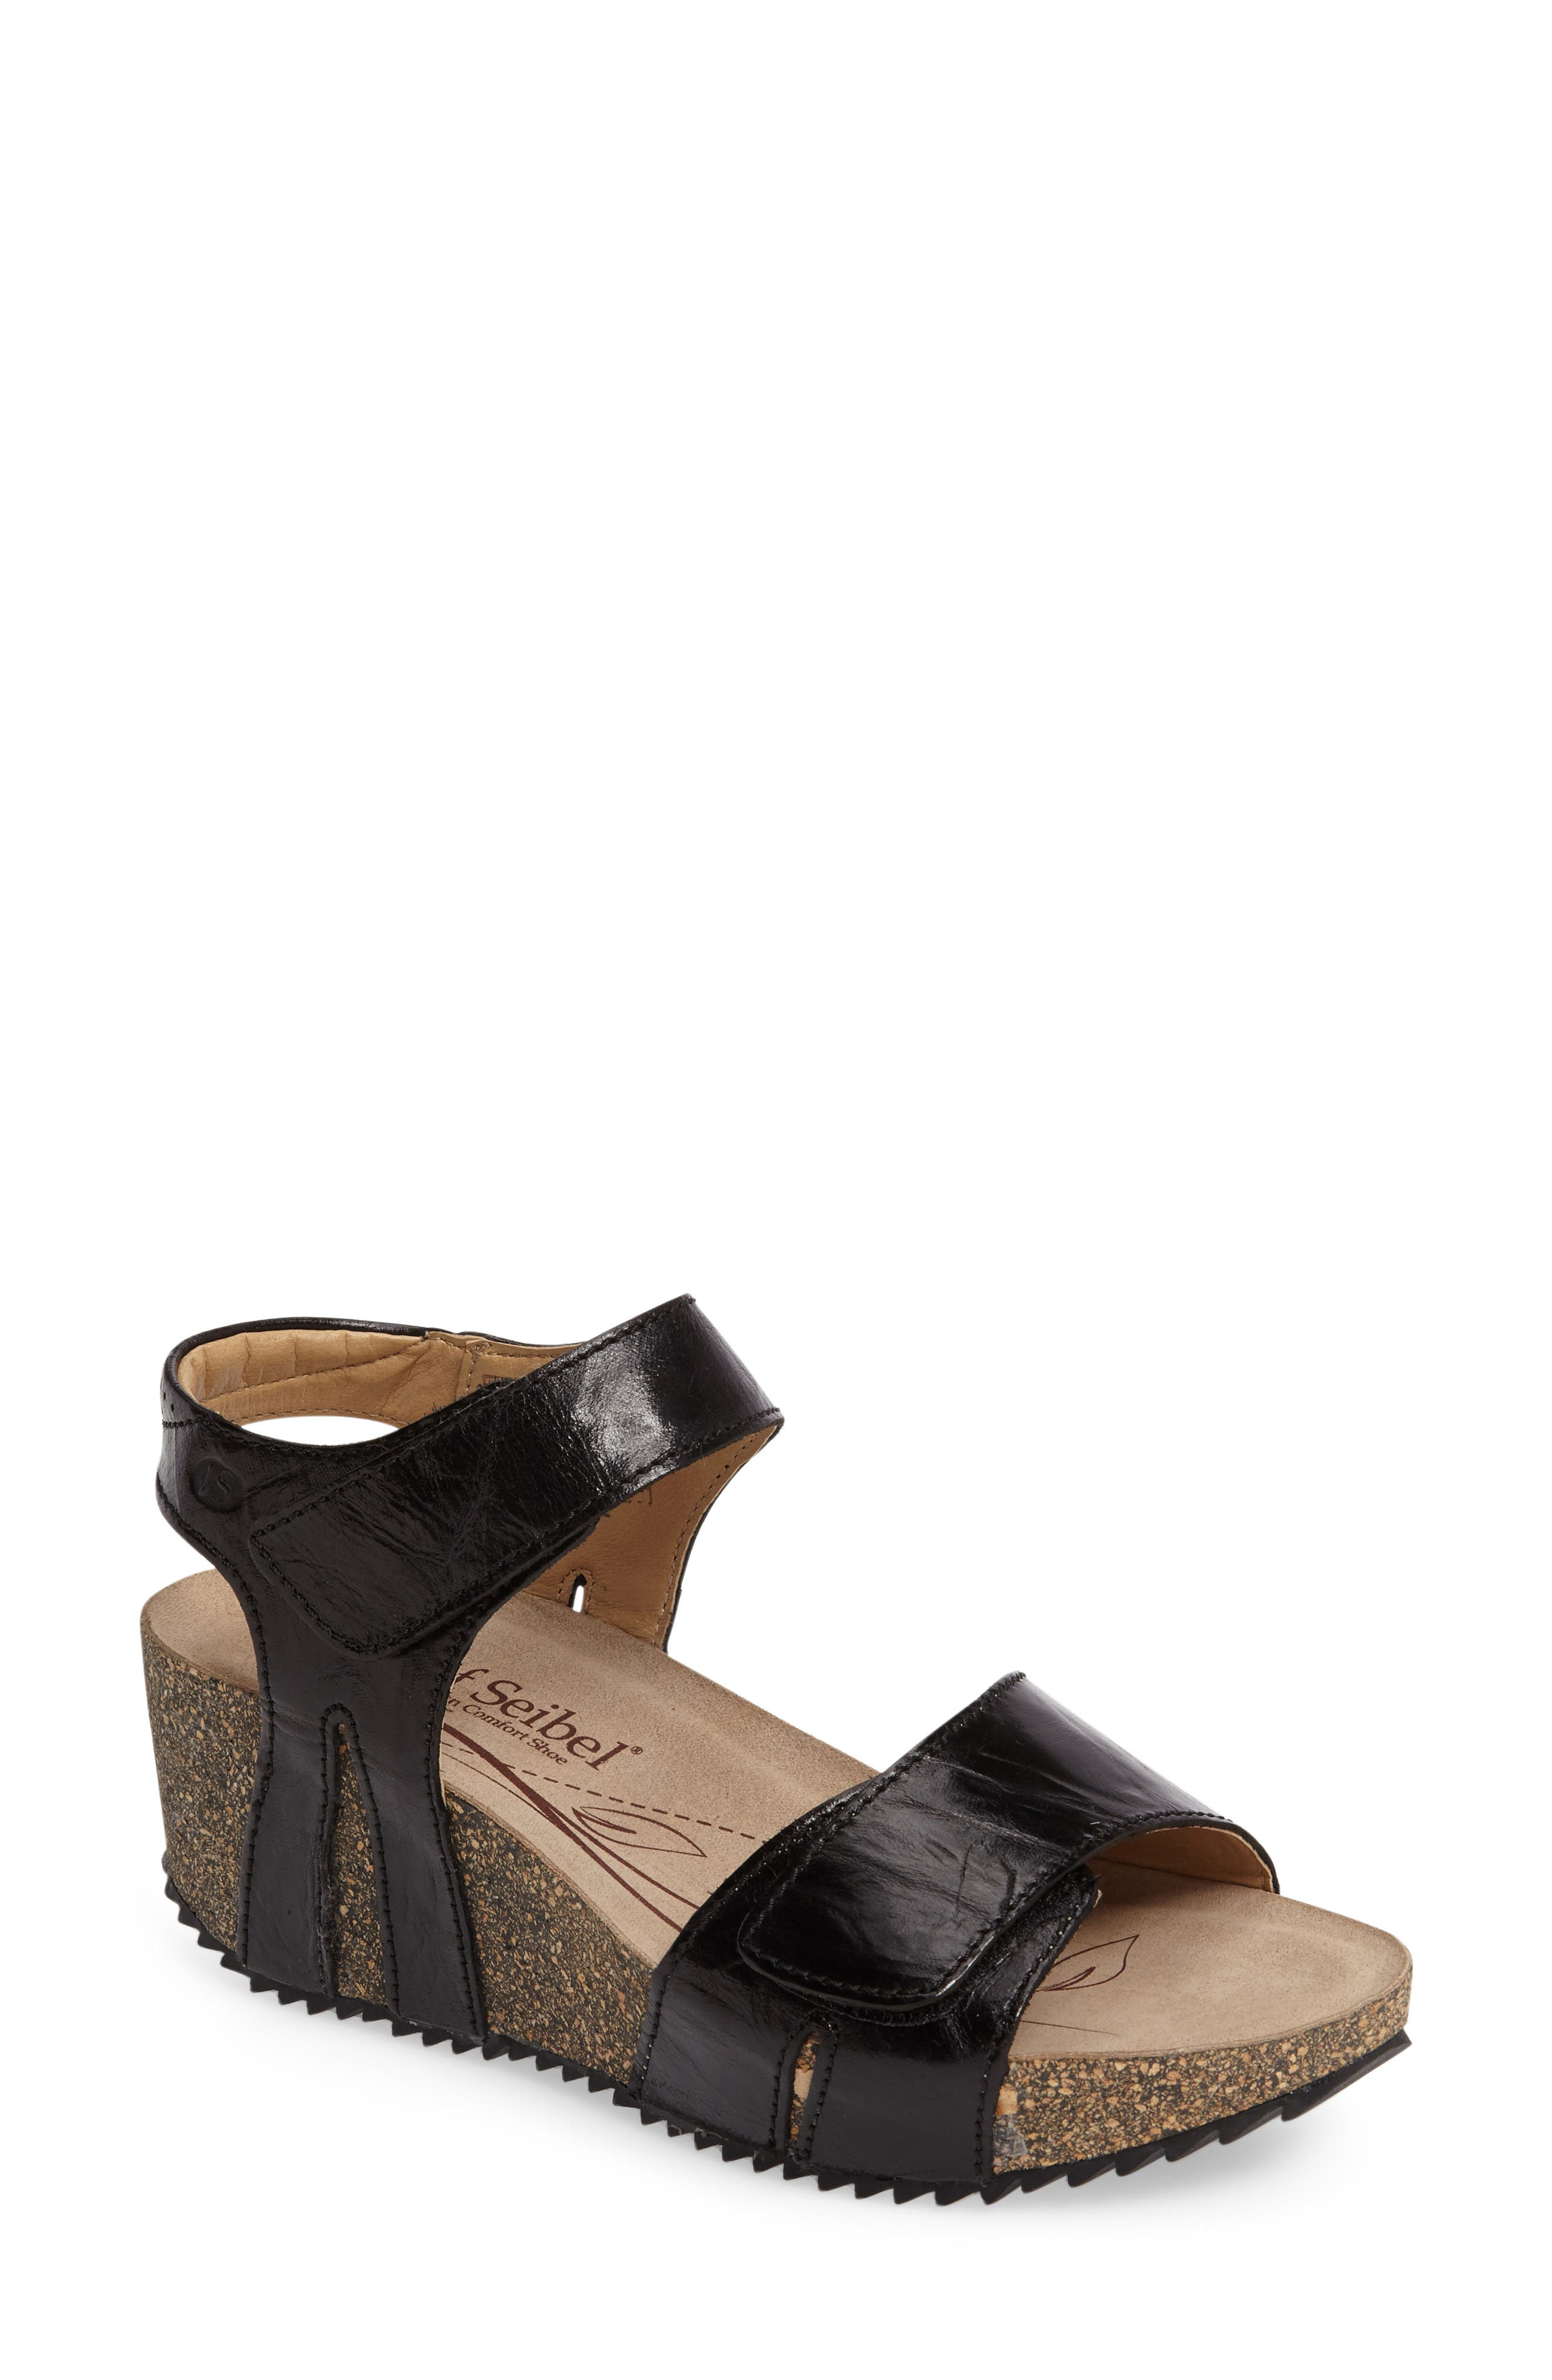 Alternate Image 1 Selected - Josef Seibel Meike 11 Sandal (Women)